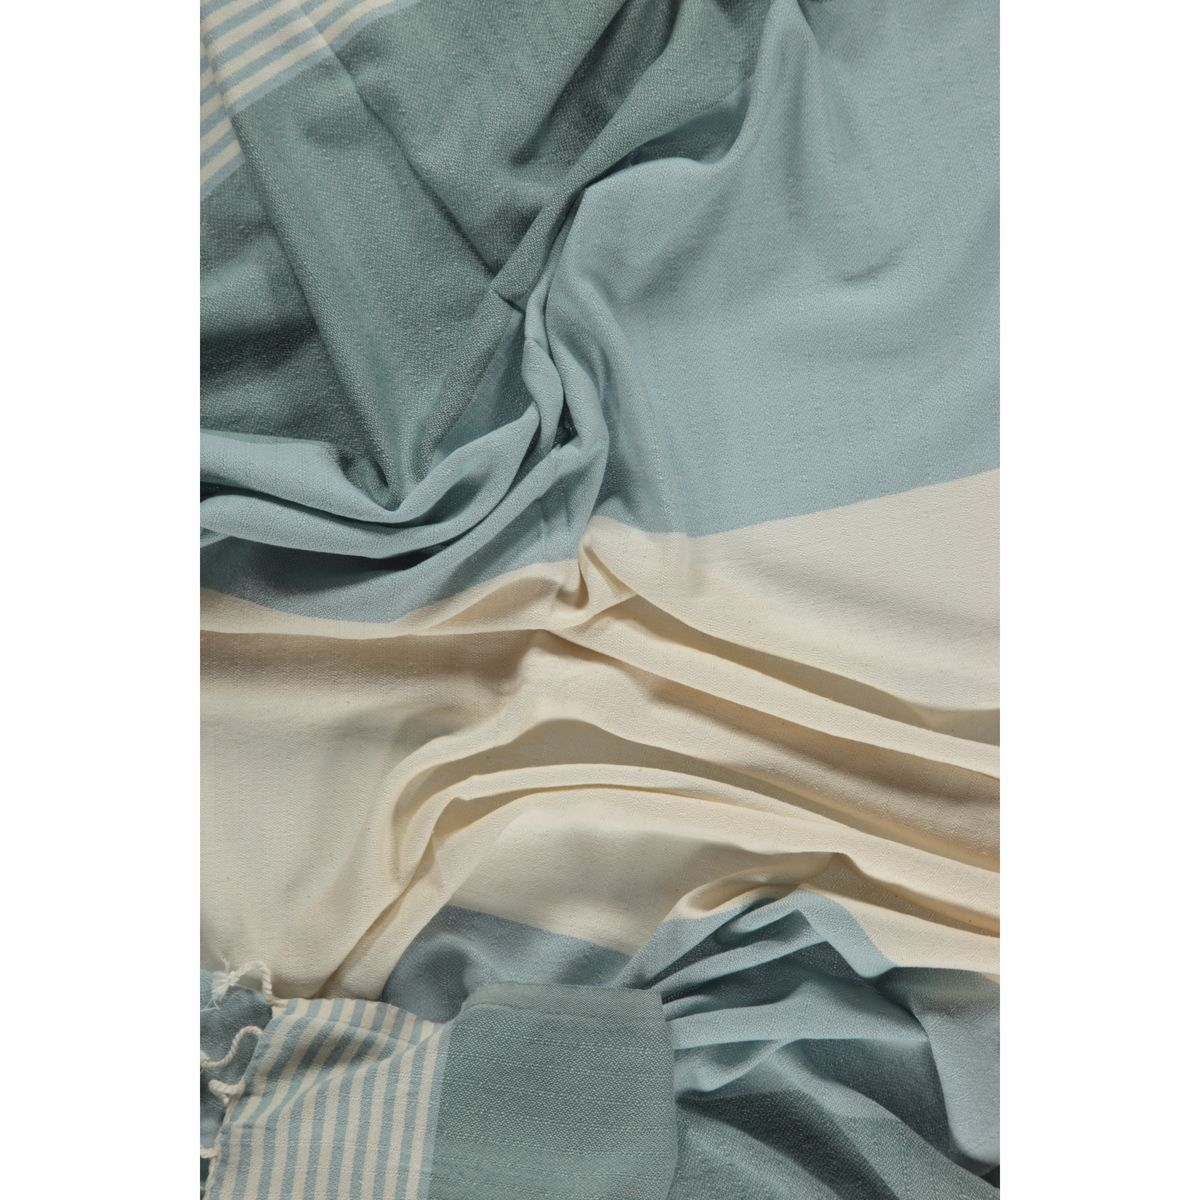 Peshtemal Twin Sultan - Light Blue / Almond Green